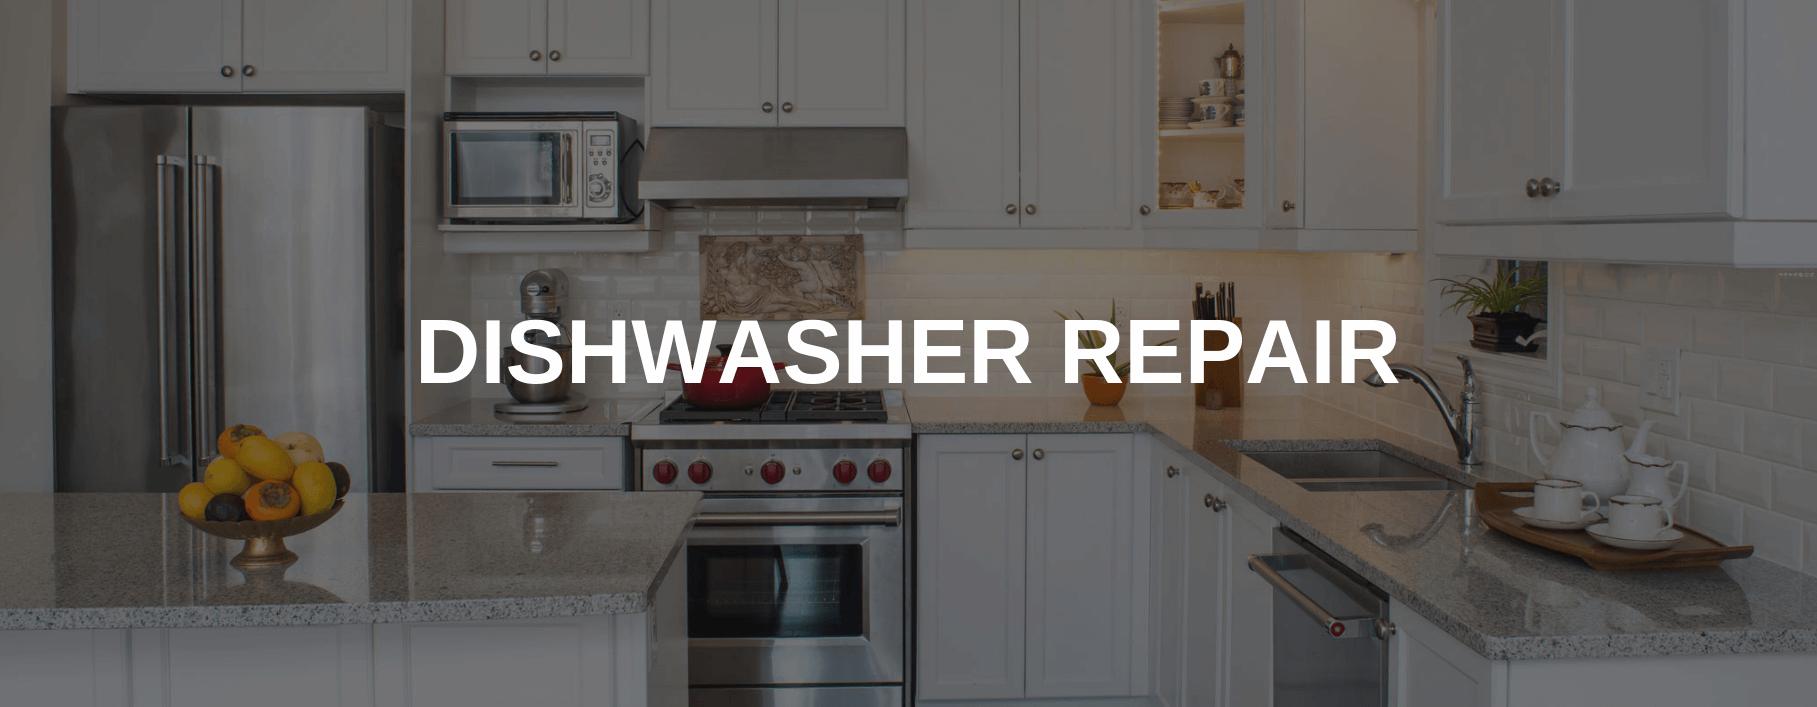 dishwasher repair east orange